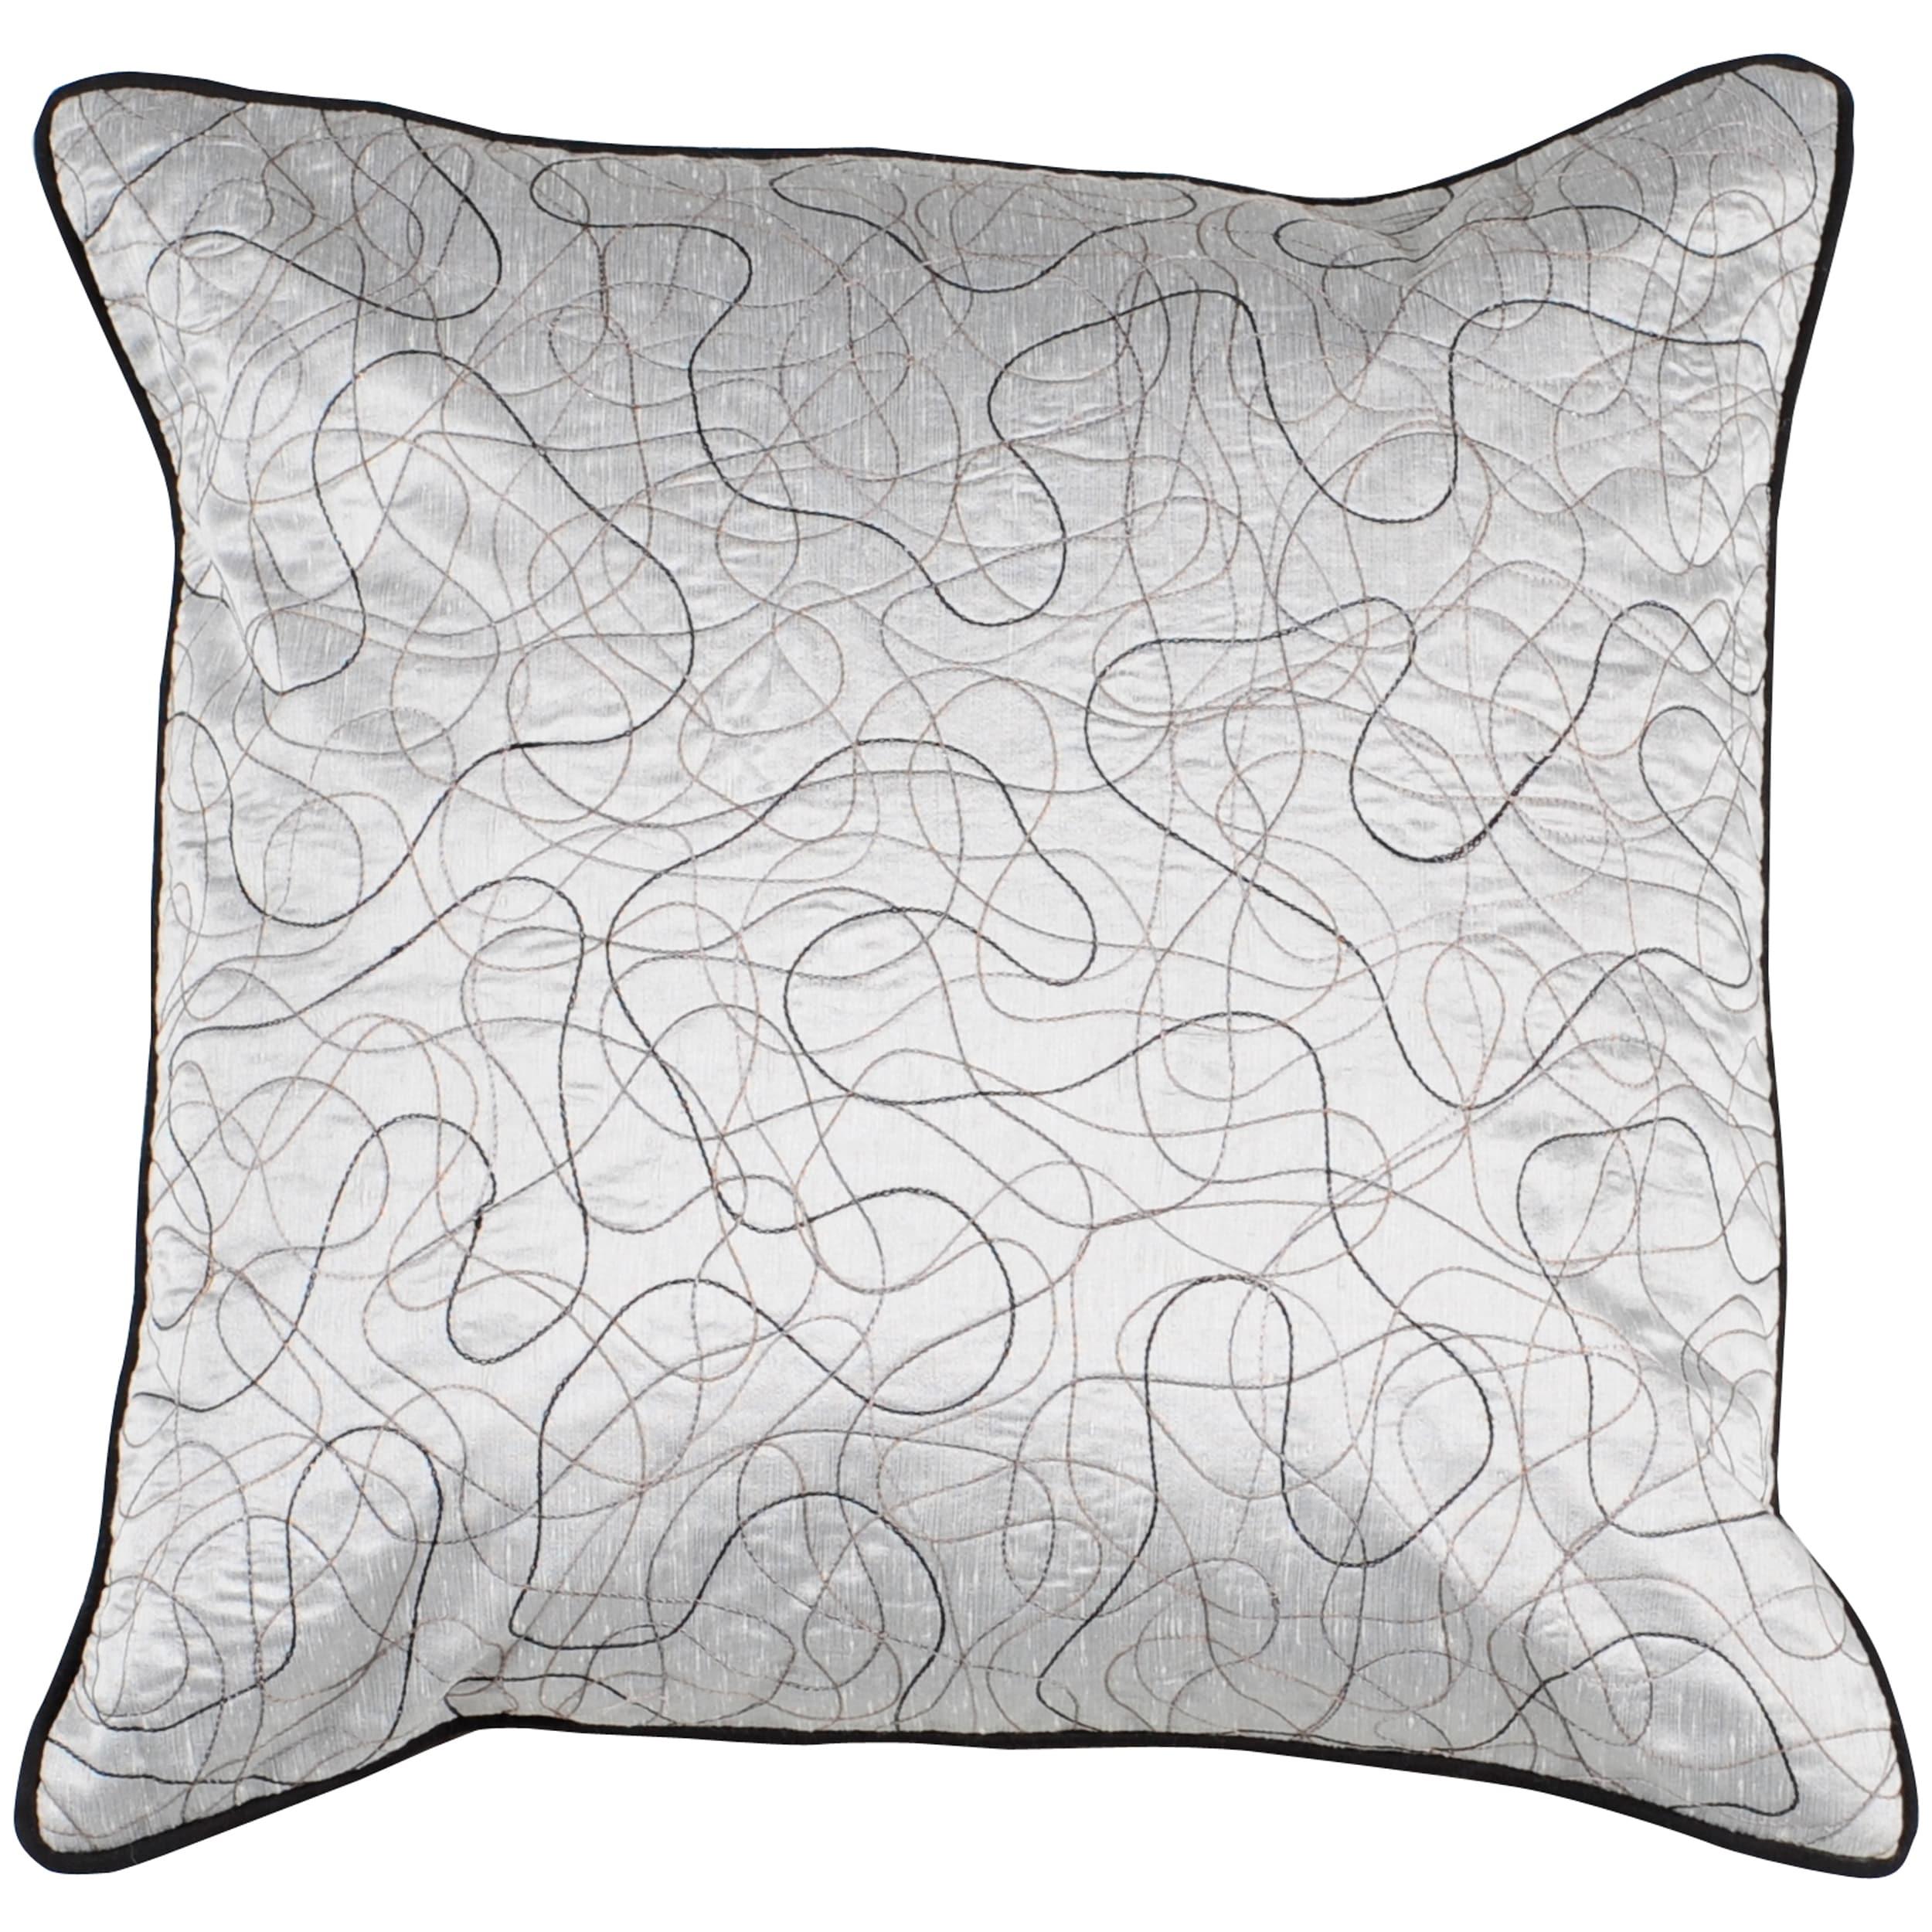 Decorative Topstitched Pro 18x18 Down Pillow